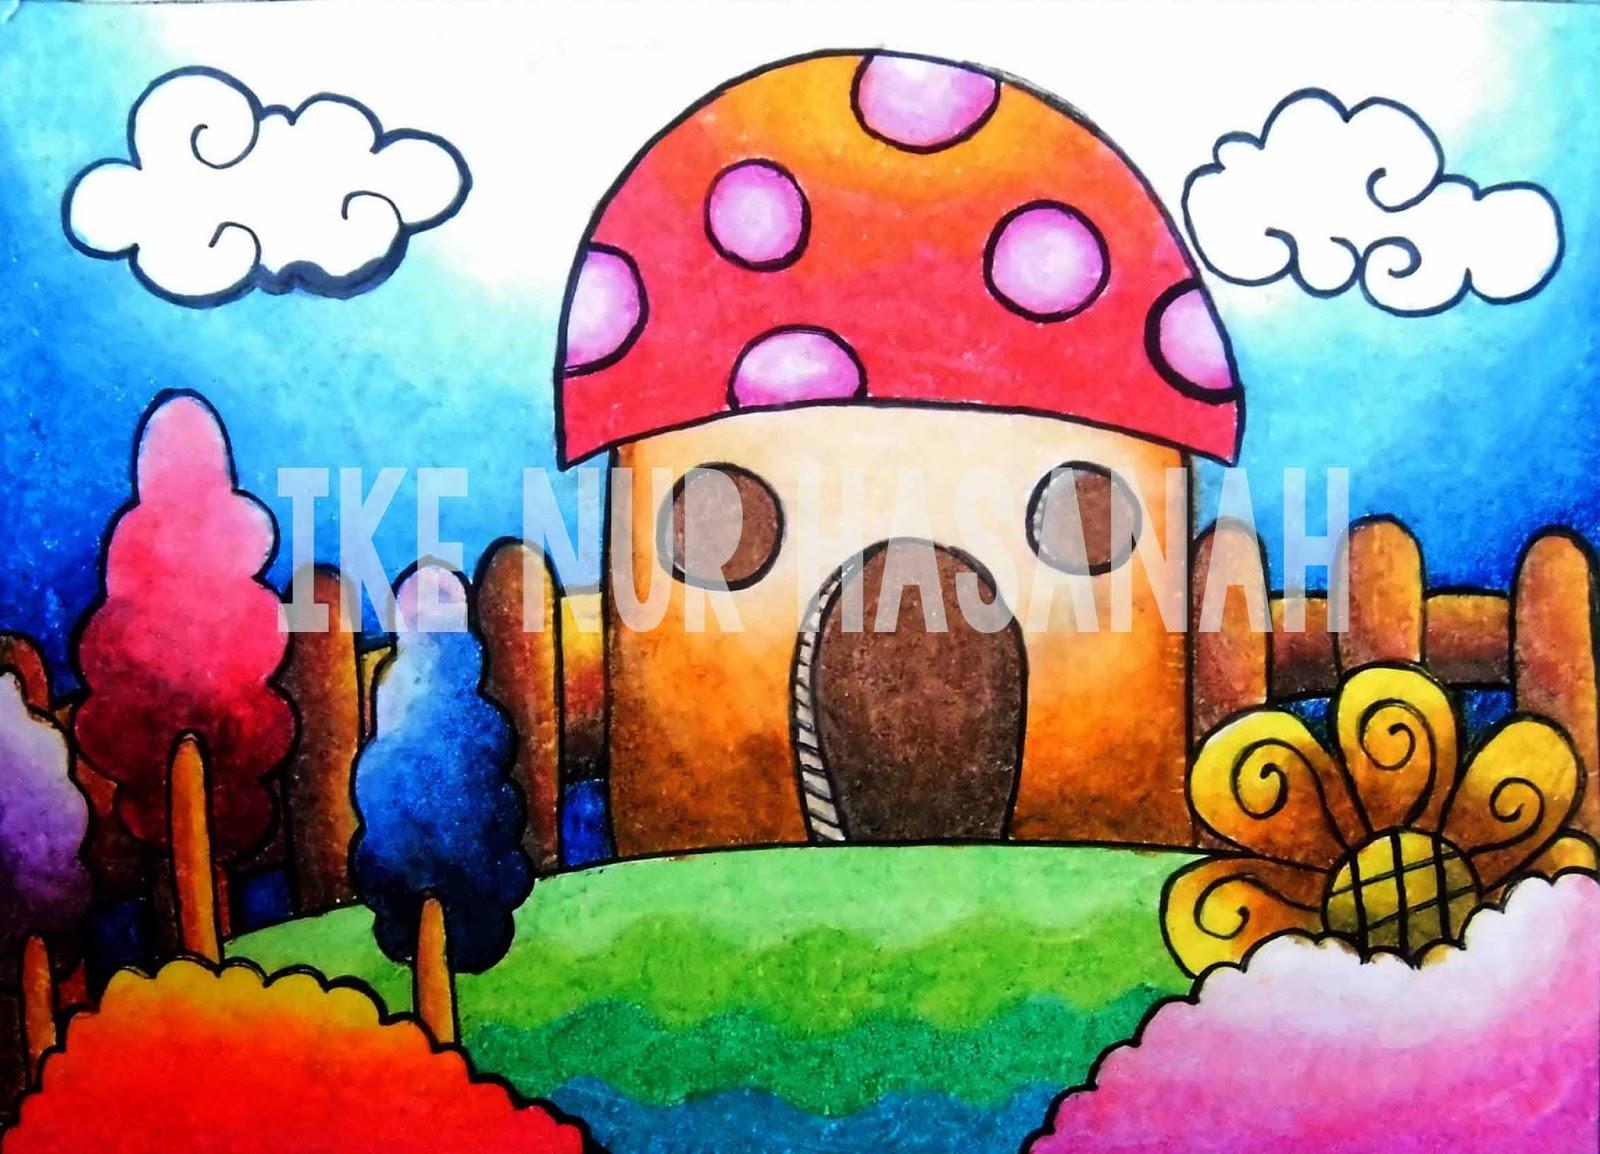 sekarang ku persembahkan hasil dari mewarna menggunakan crayon dengan warna gradasi